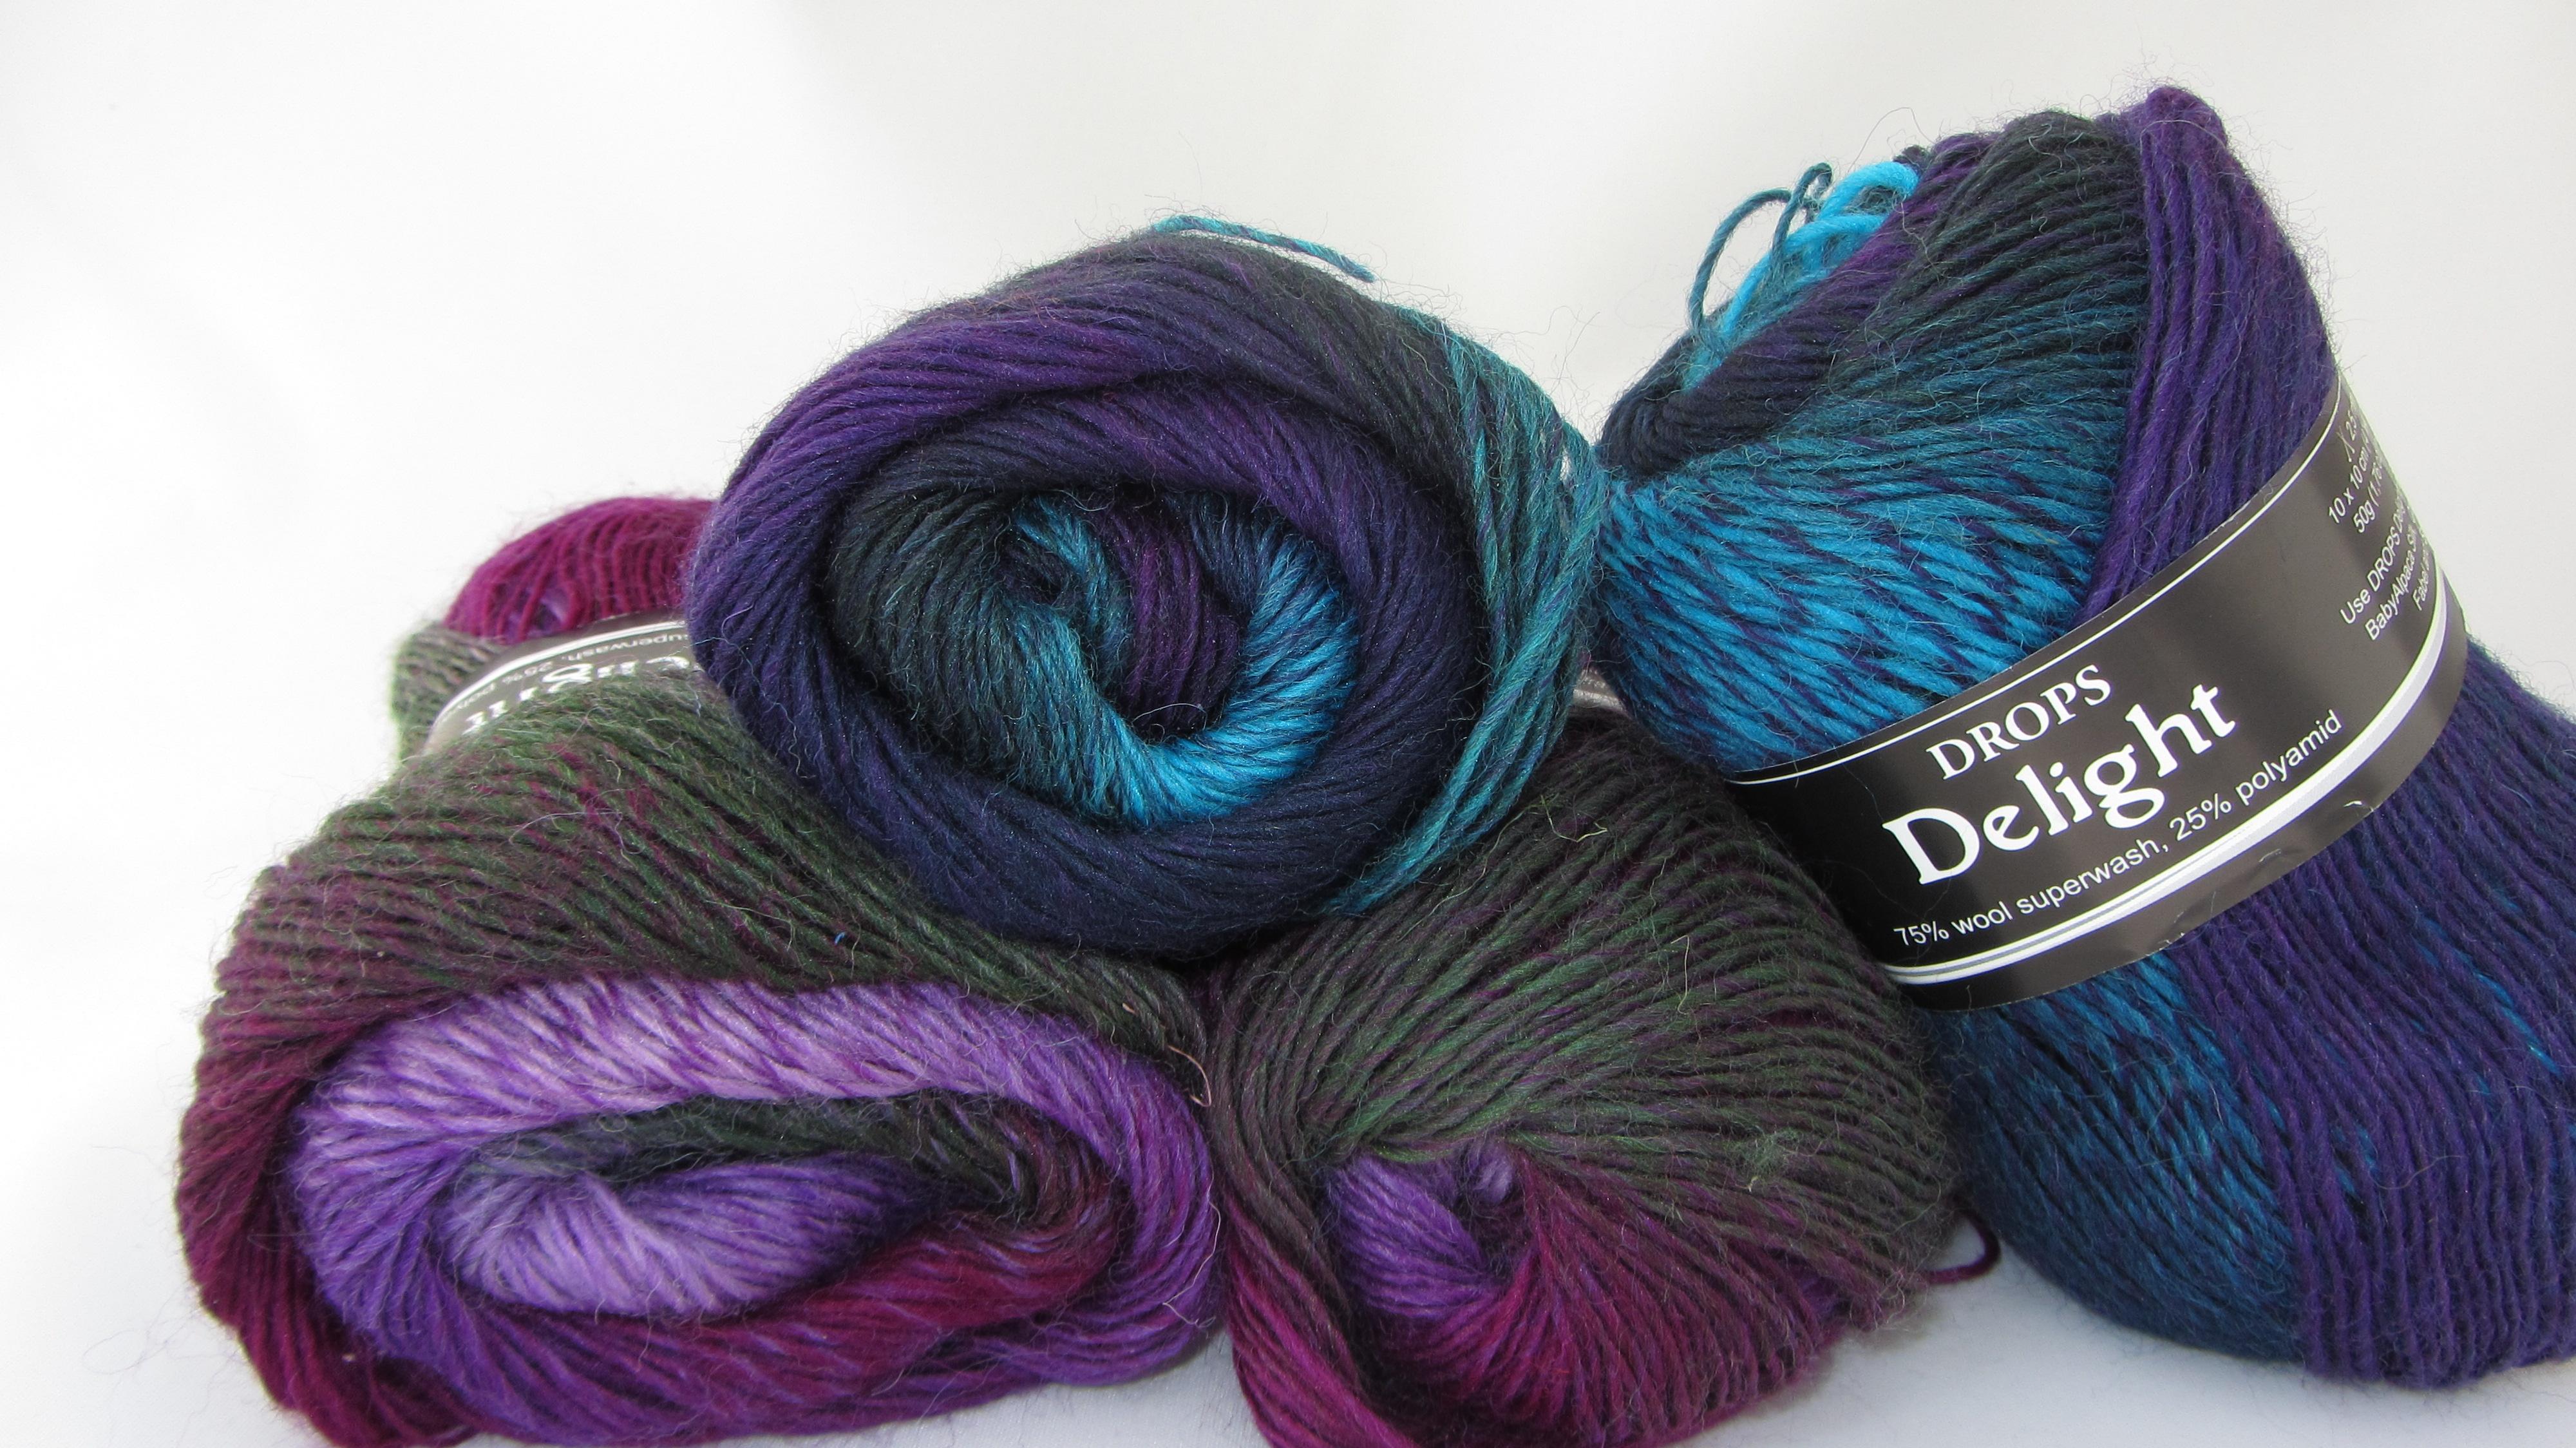 Drops Delight Yarn